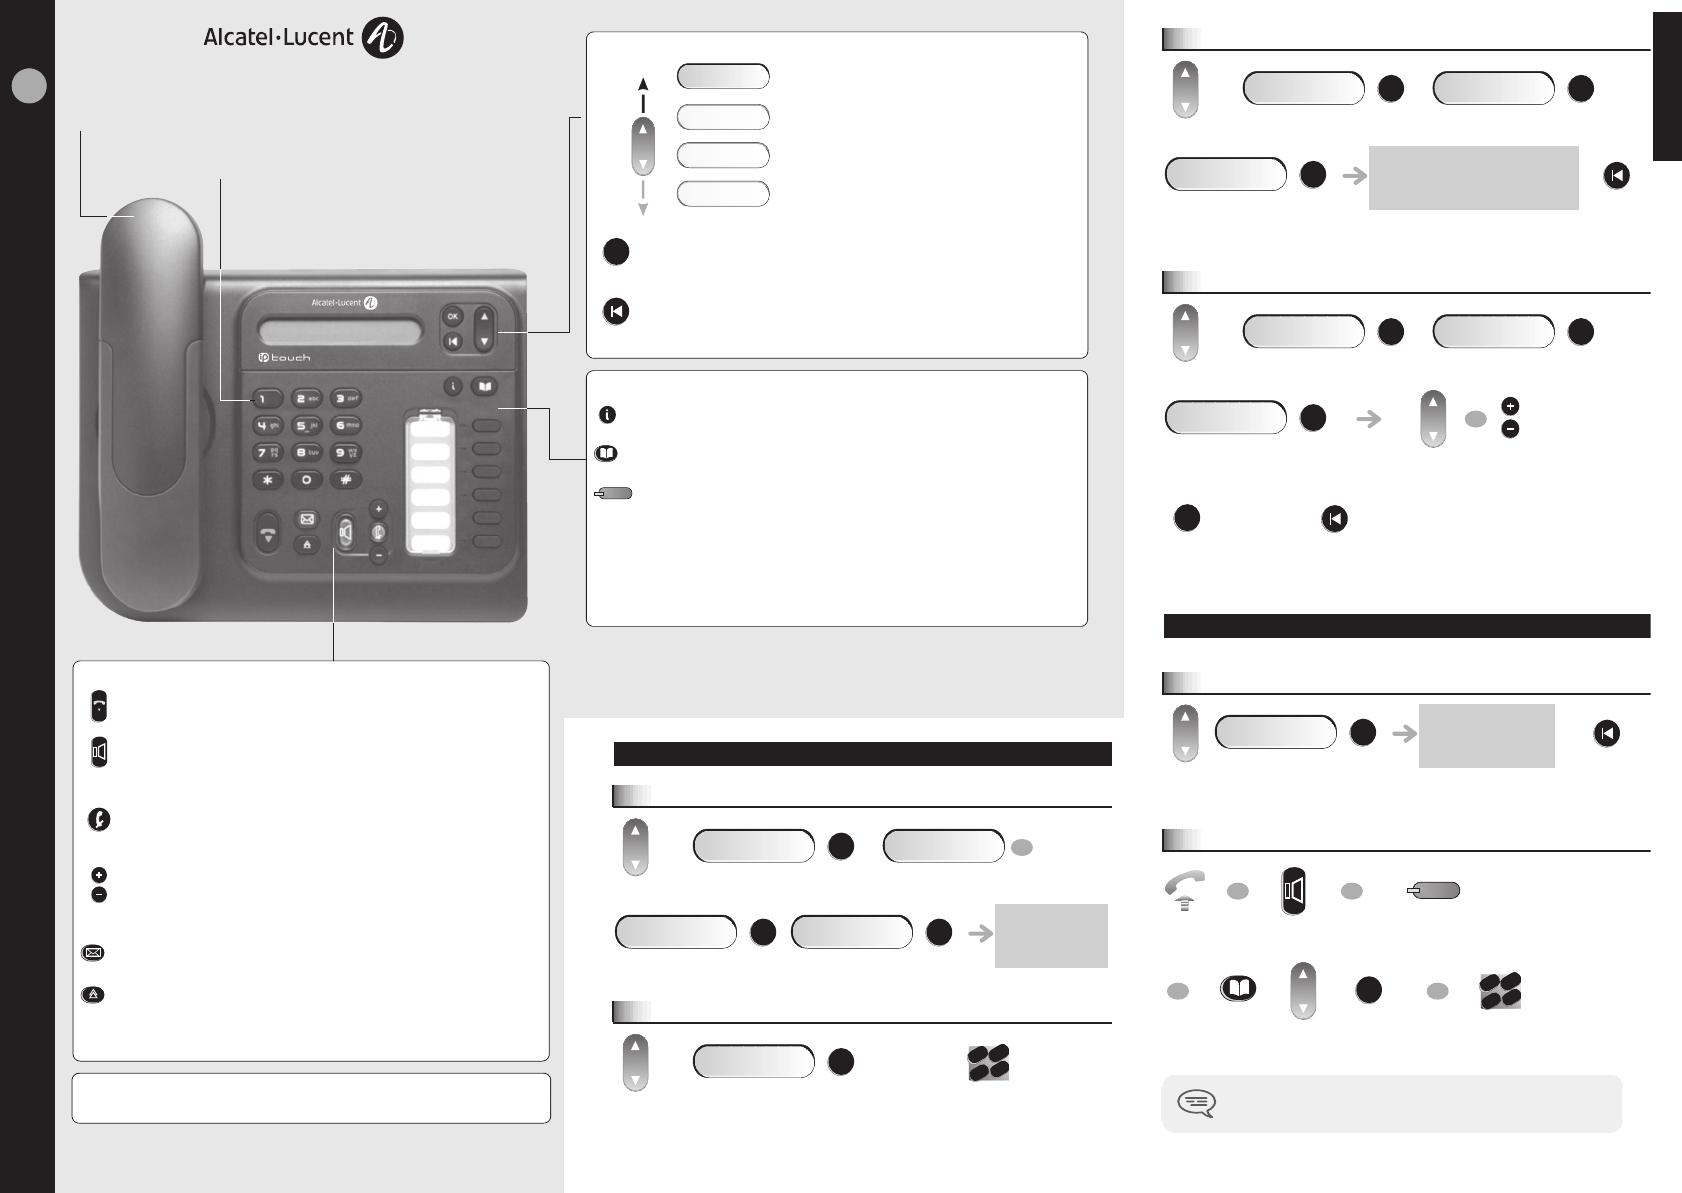 handleiding alcatel 4019 pagina 1 van 2 english rh gebruikershandleiding com alcatel lucent telephone 4019 manual alcatel lucent 4019 manuel